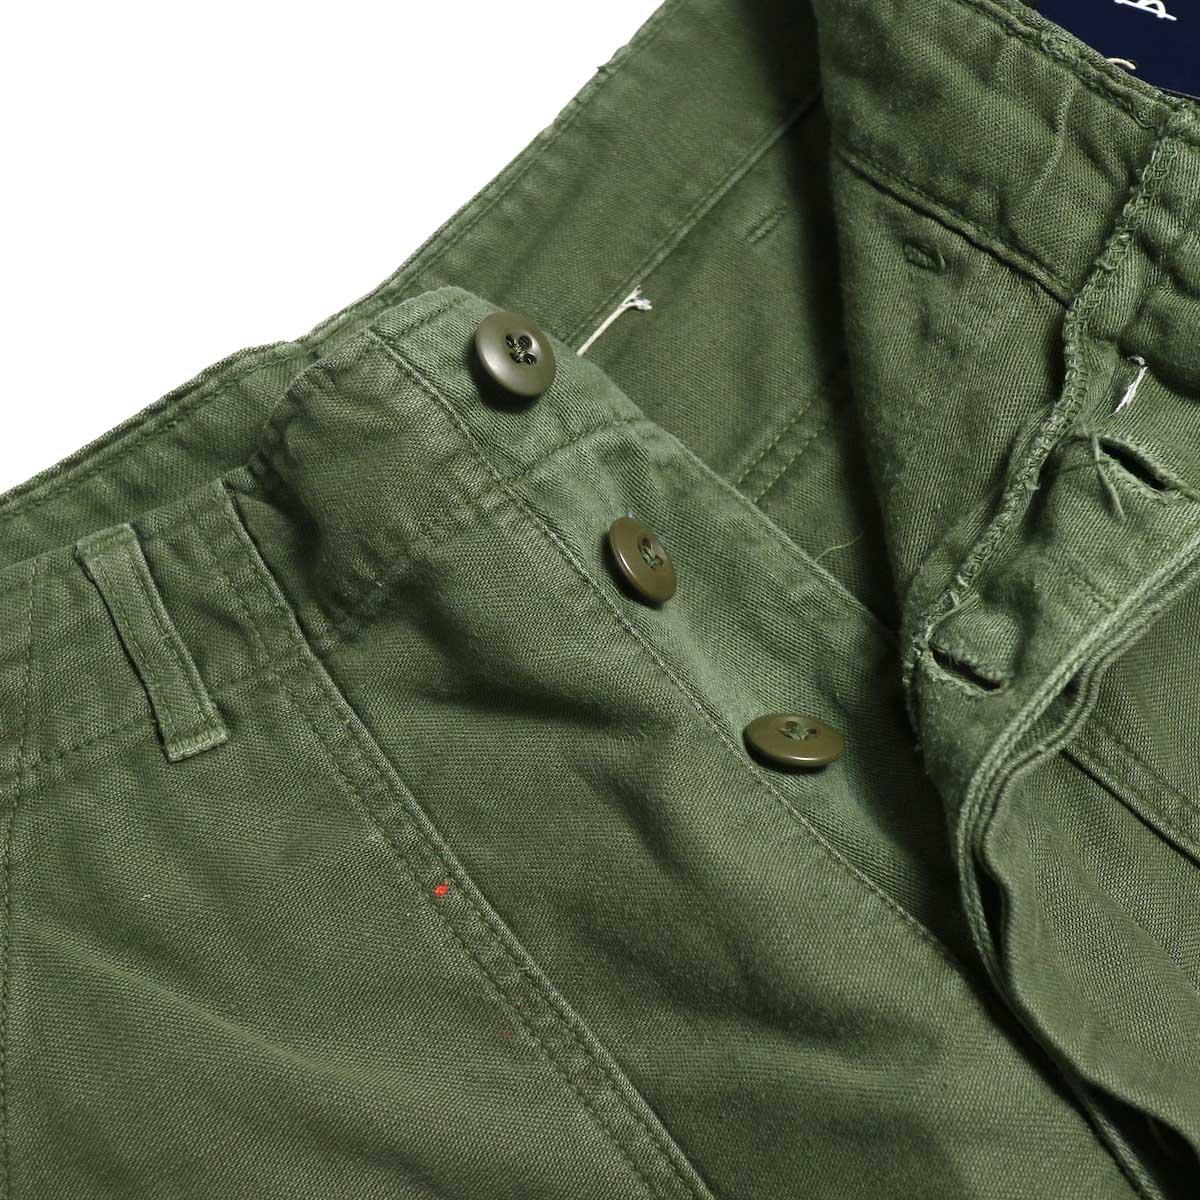 BONUM / Military FAT Pants (A) ボタンフライ